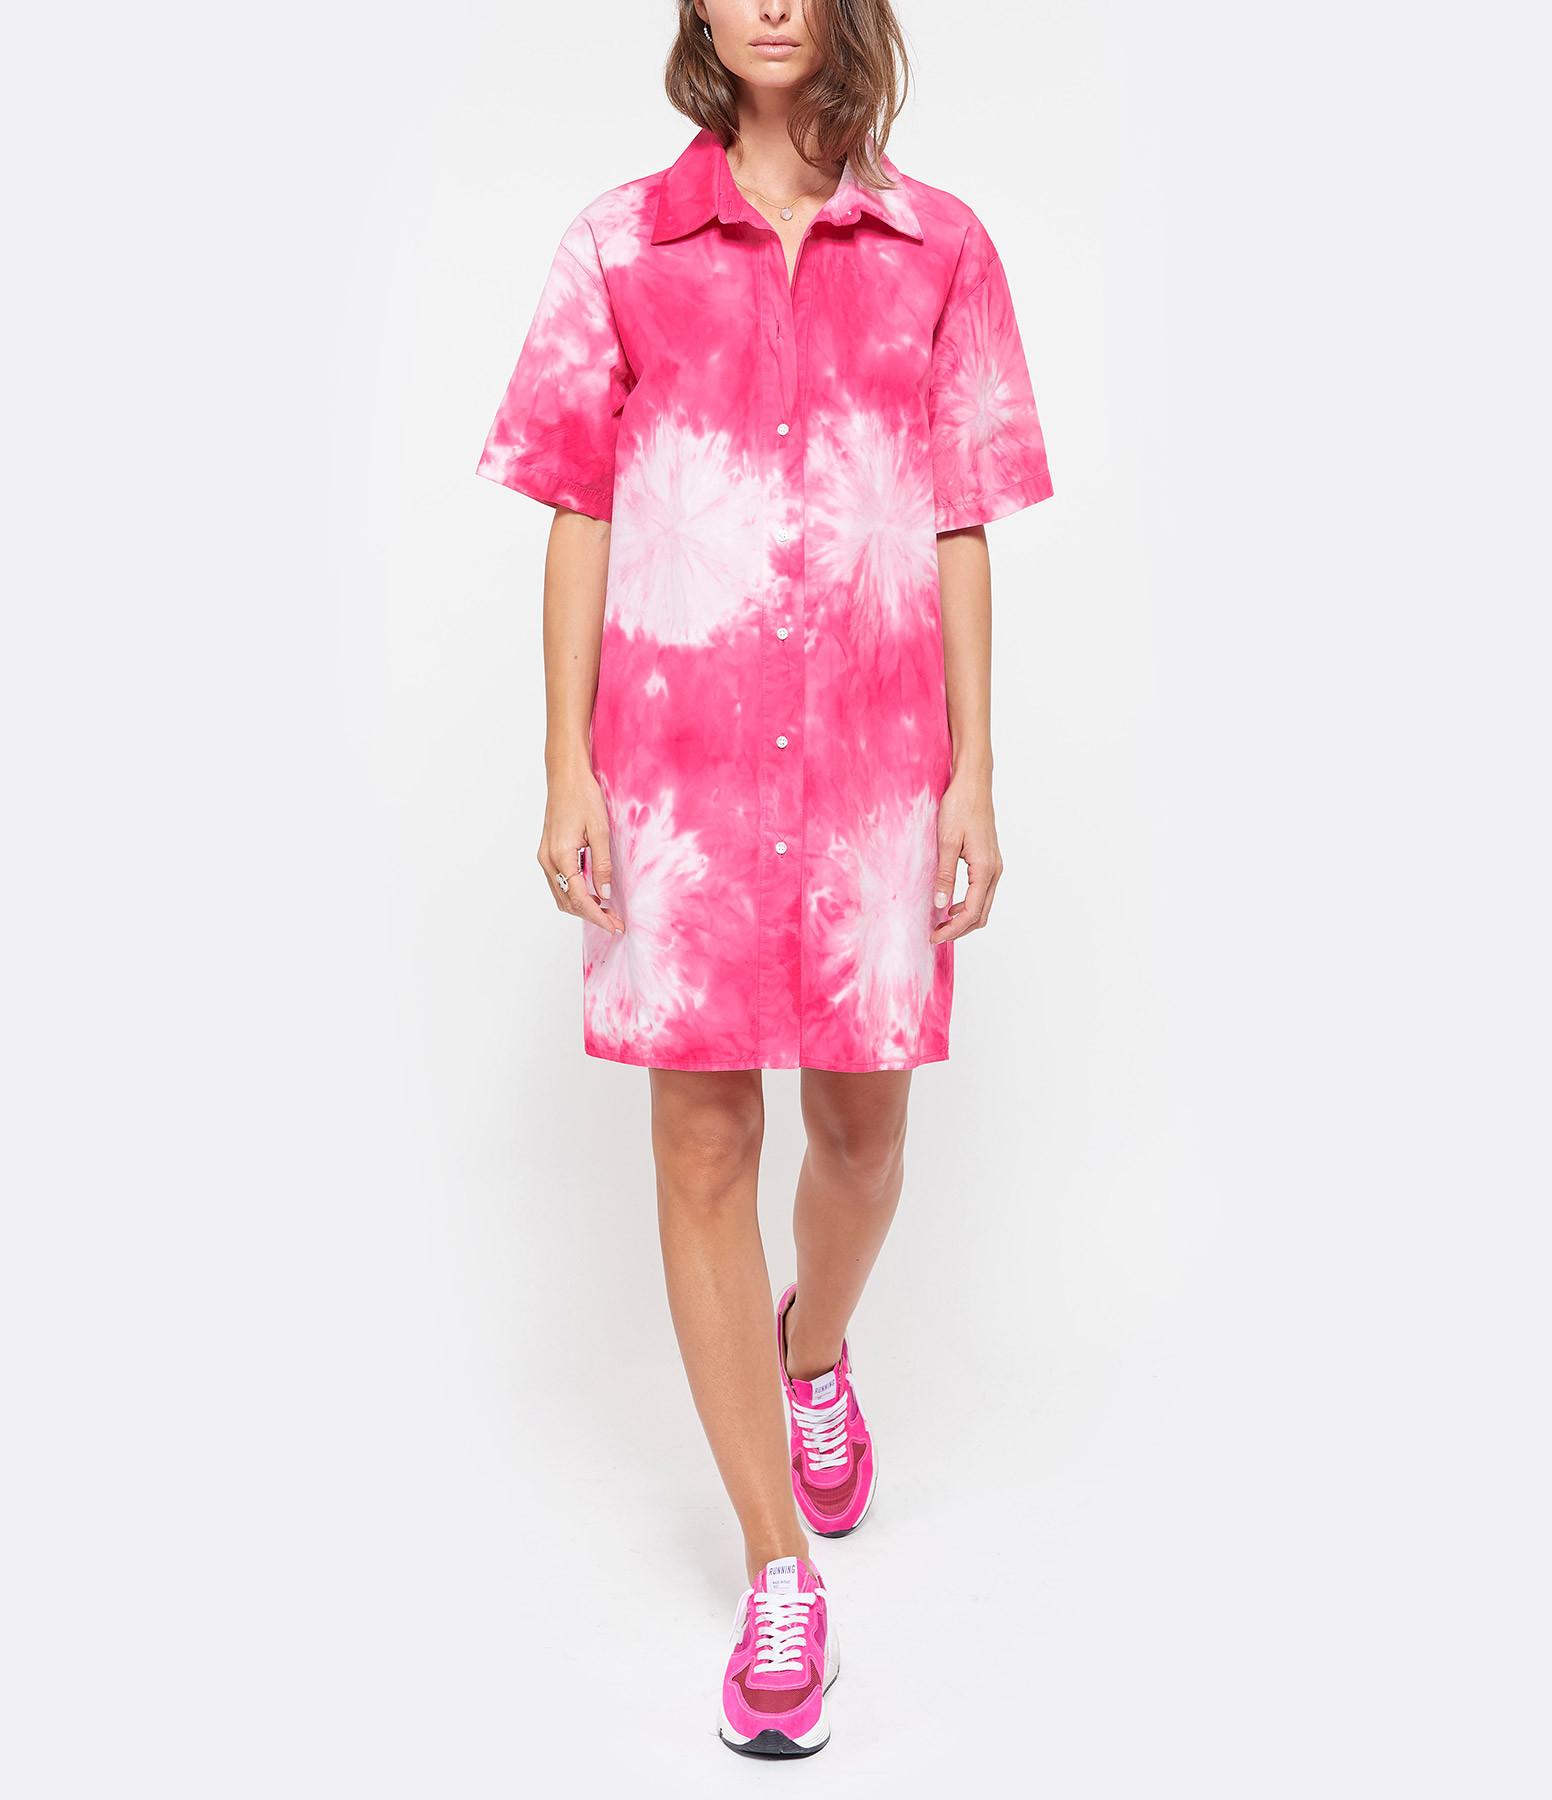 MSGM - Robe Chemise Tie & Dye Rose Fushia